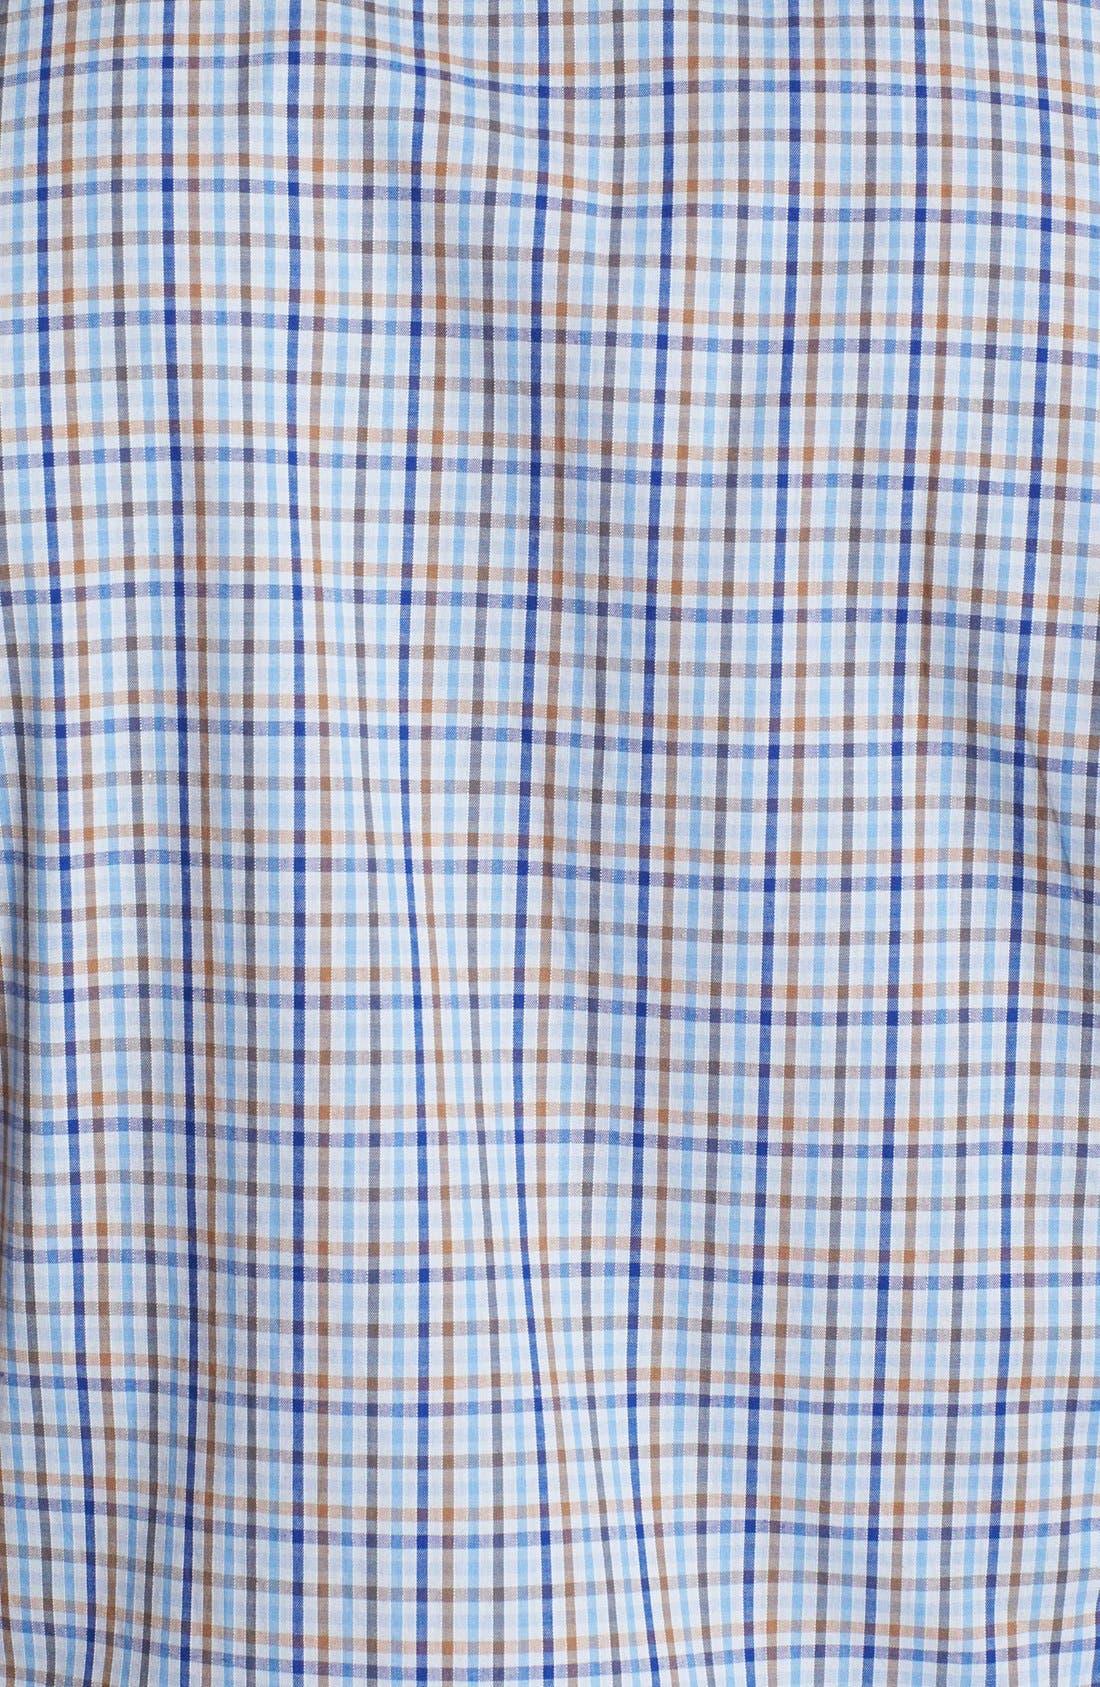 Alternate Image 2  - Ben Sherman Check Short Sleeve Woven Shirt